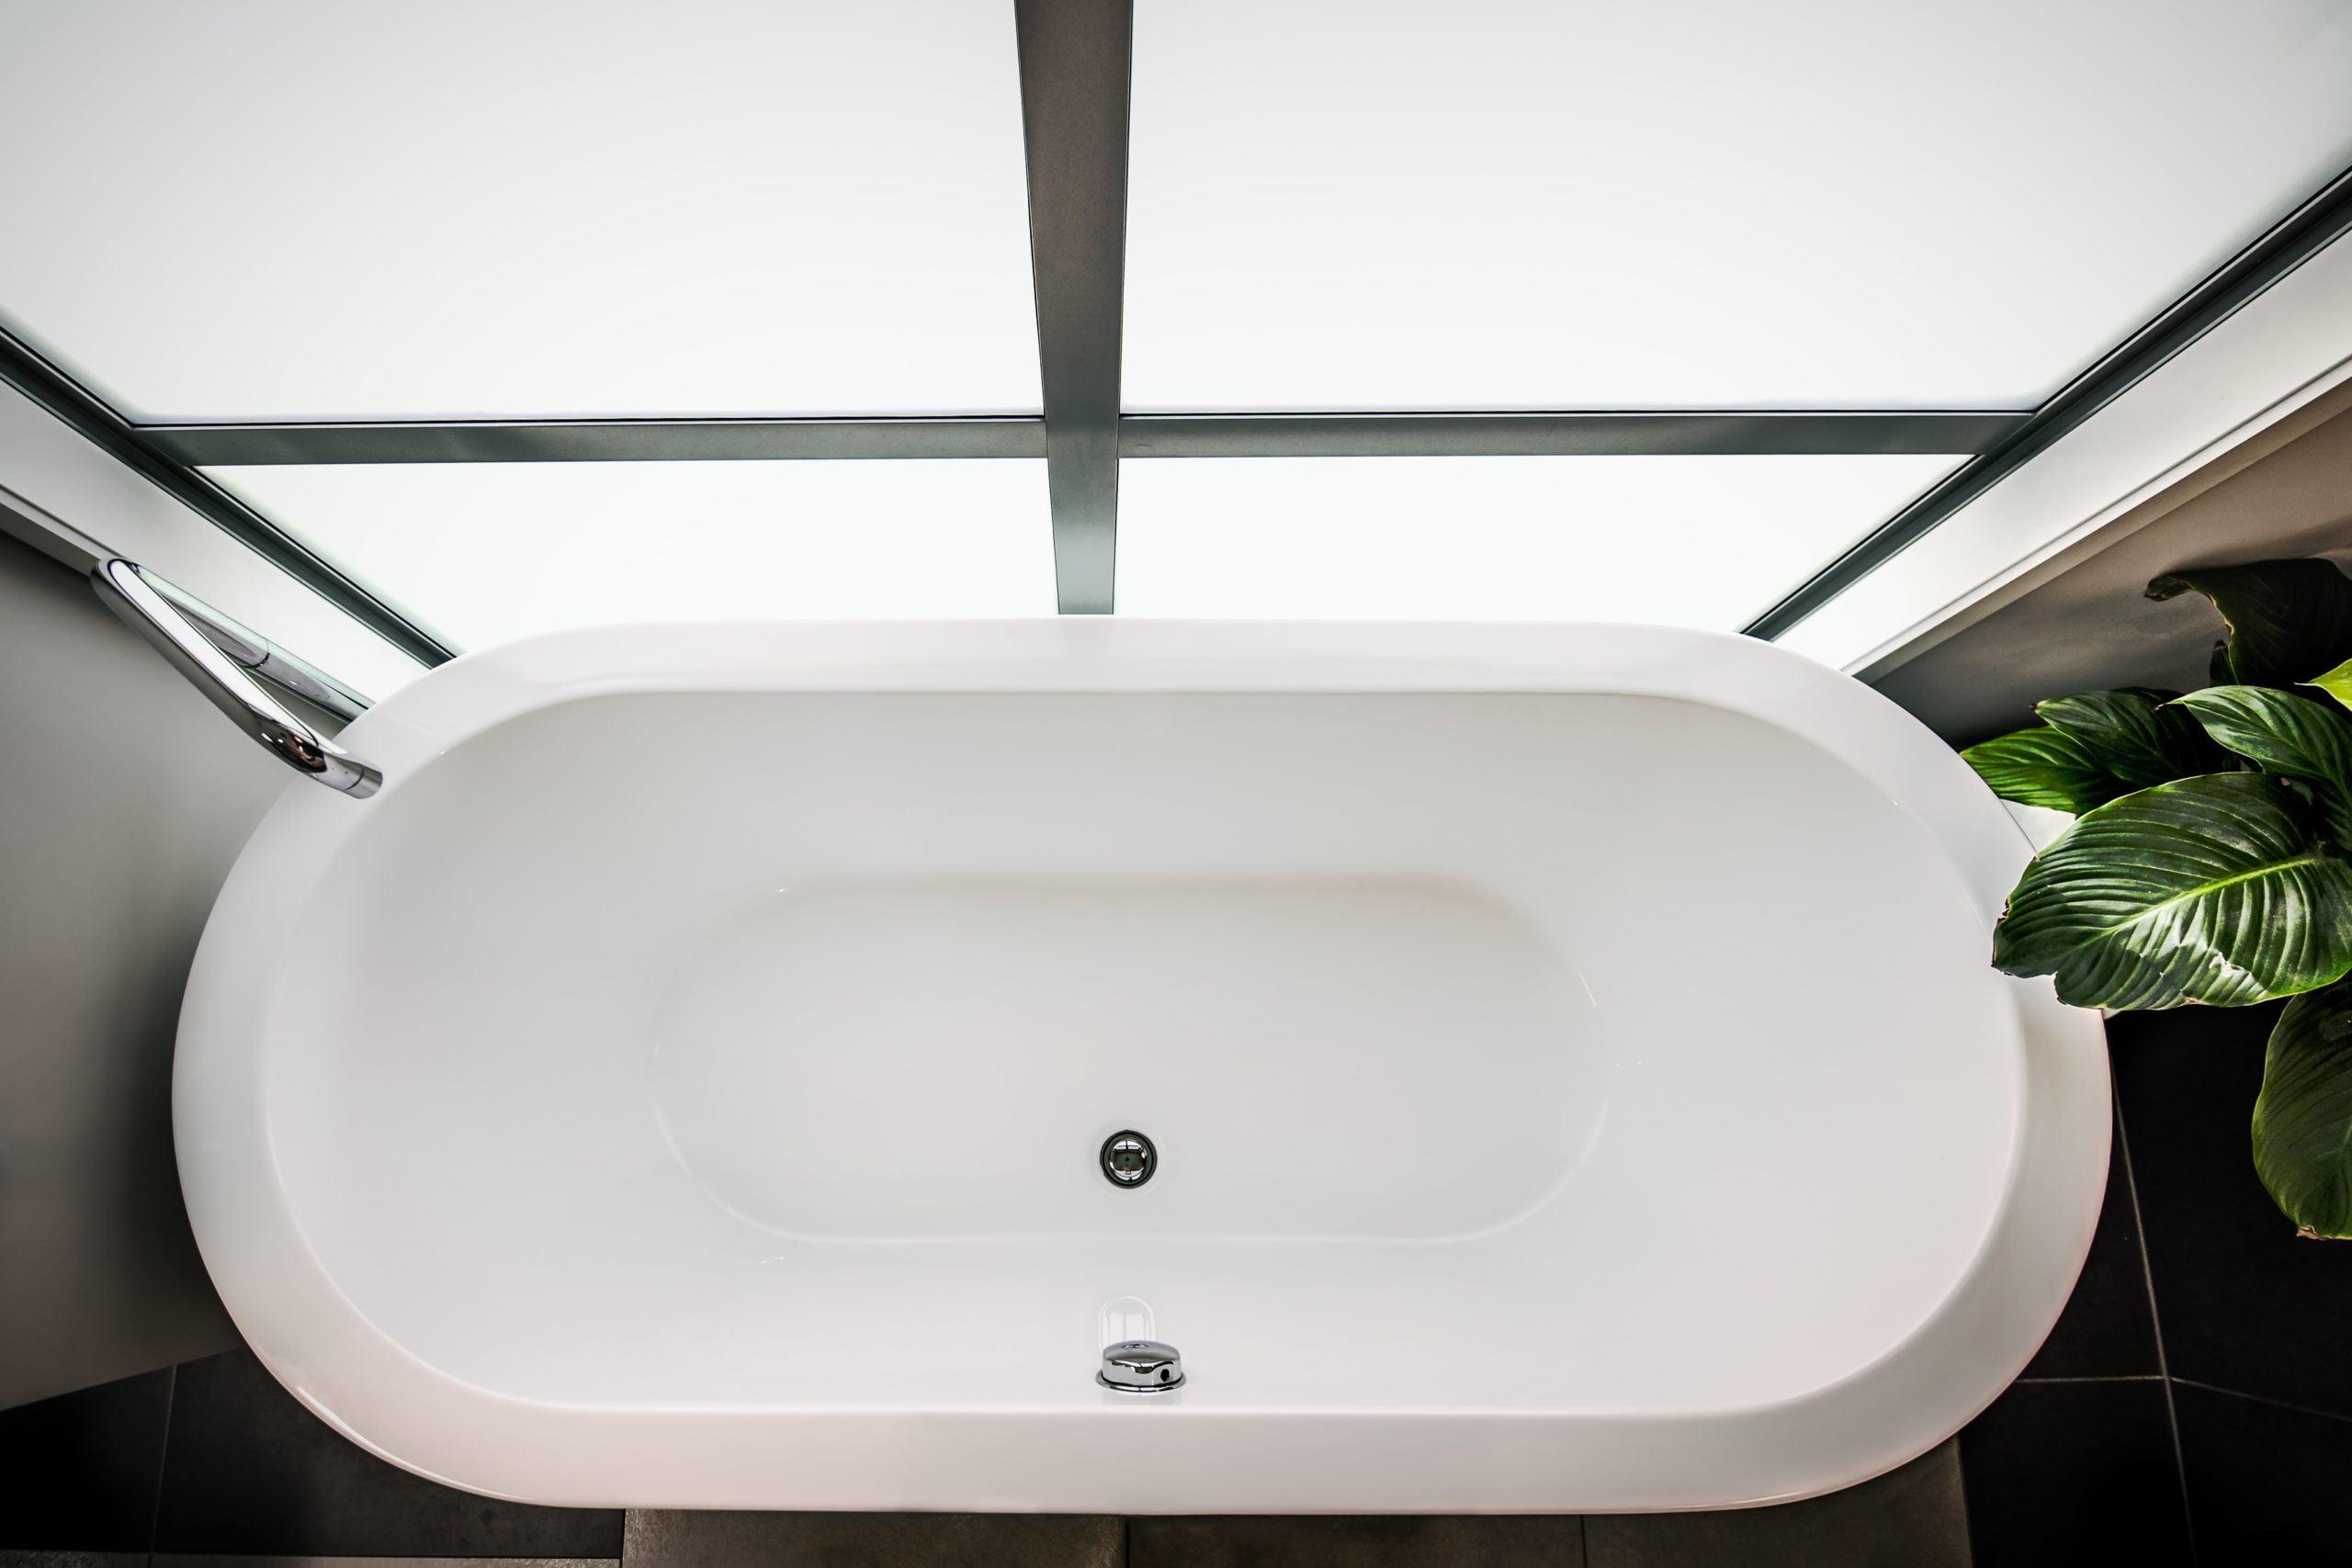 How to Refinish a Fiberglass Tub